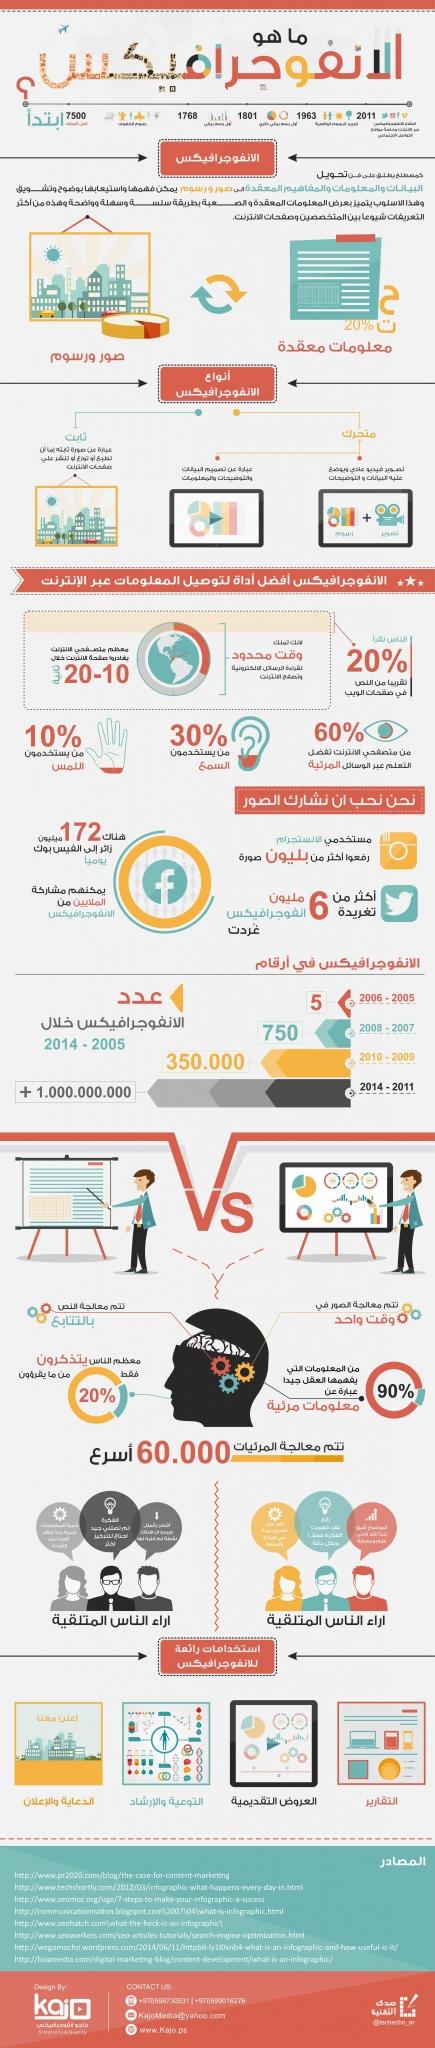 what is an infographics ما هو الإنفوجرافيكس ومتى بدأ استخدامه وما هي أنواعه